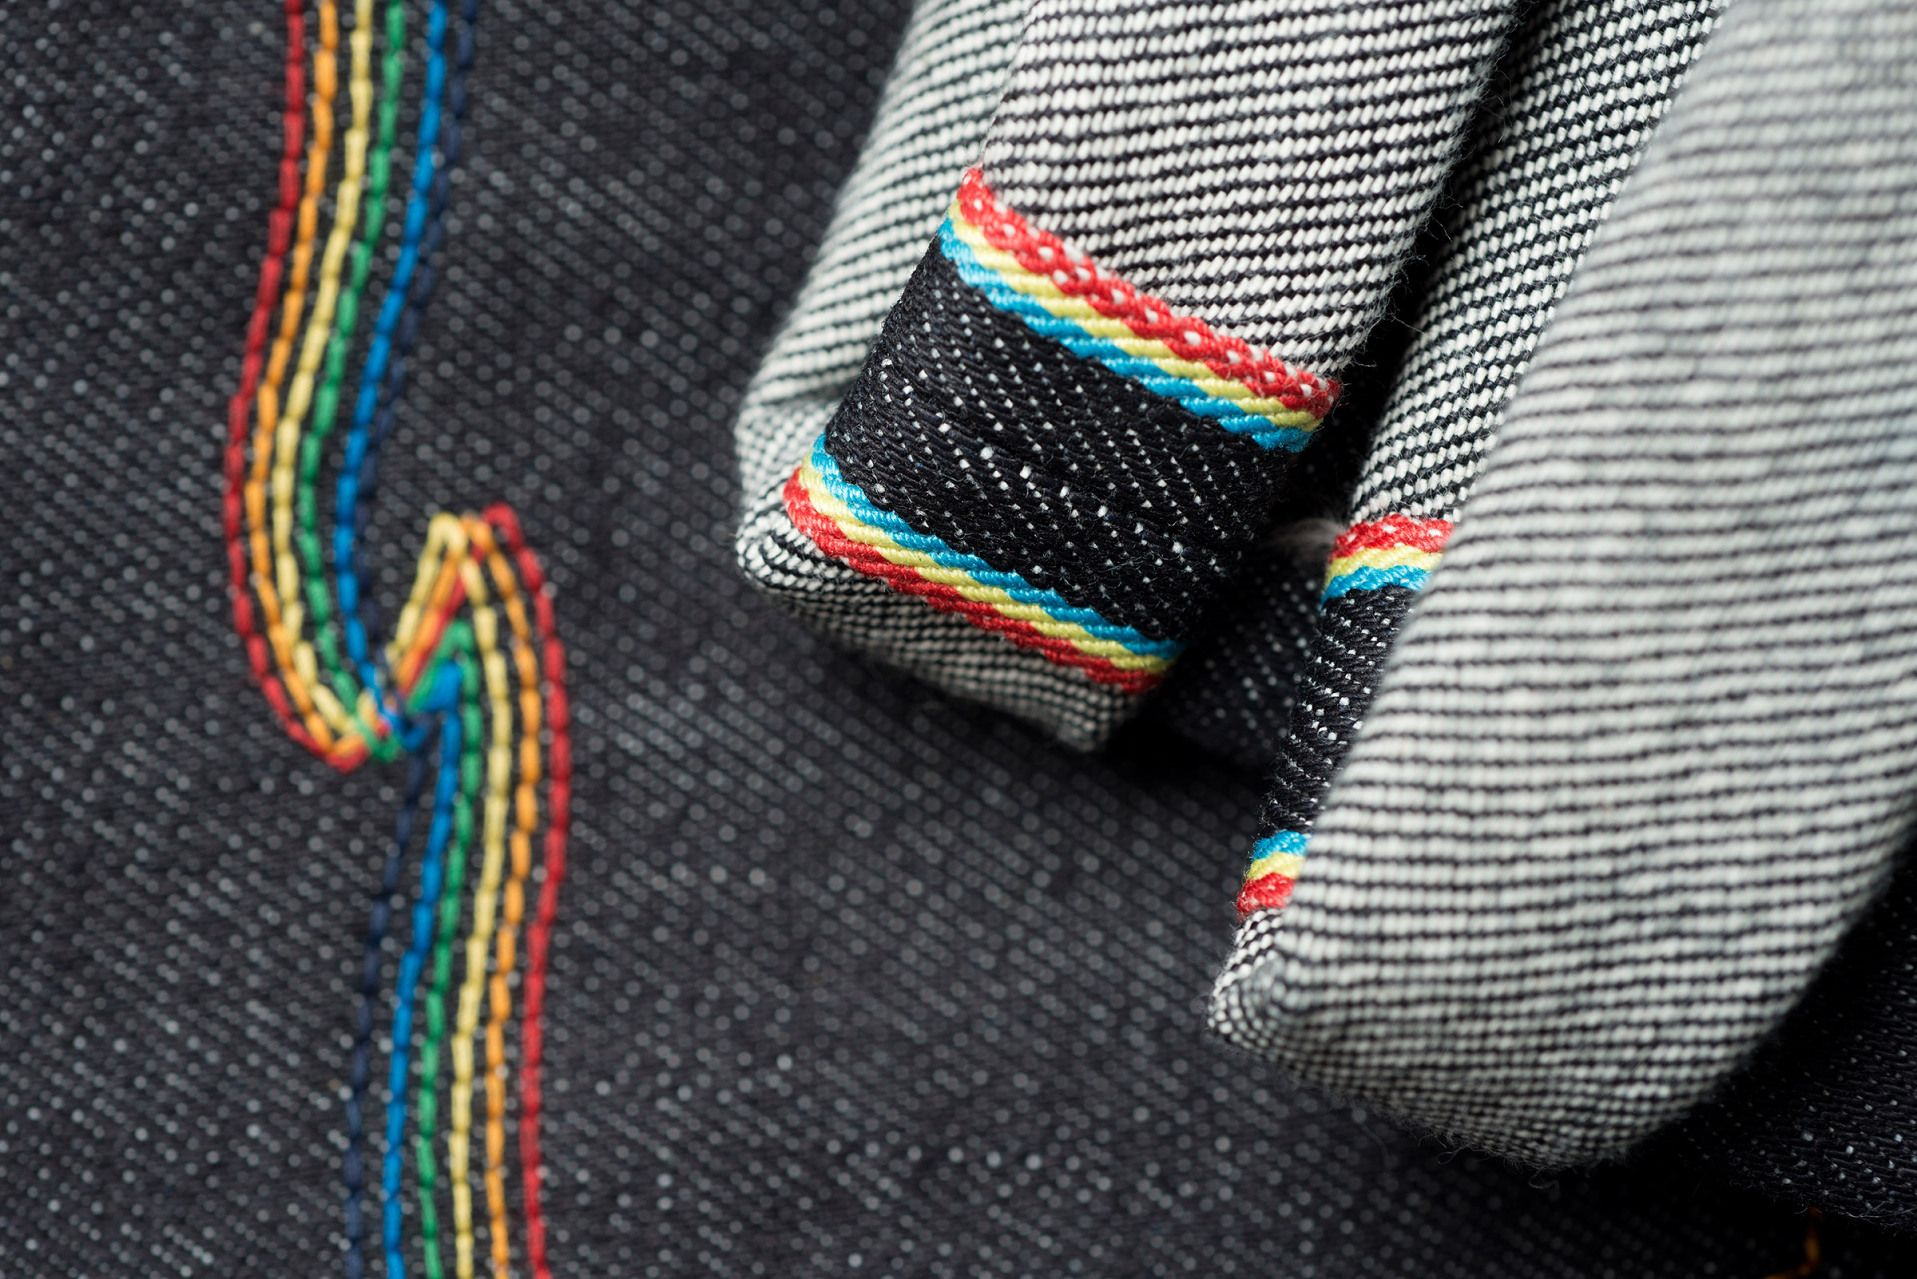 Nudie Jeans Co x Oi Polloi Grim Trim Dry Rainbow Jeans recommendations